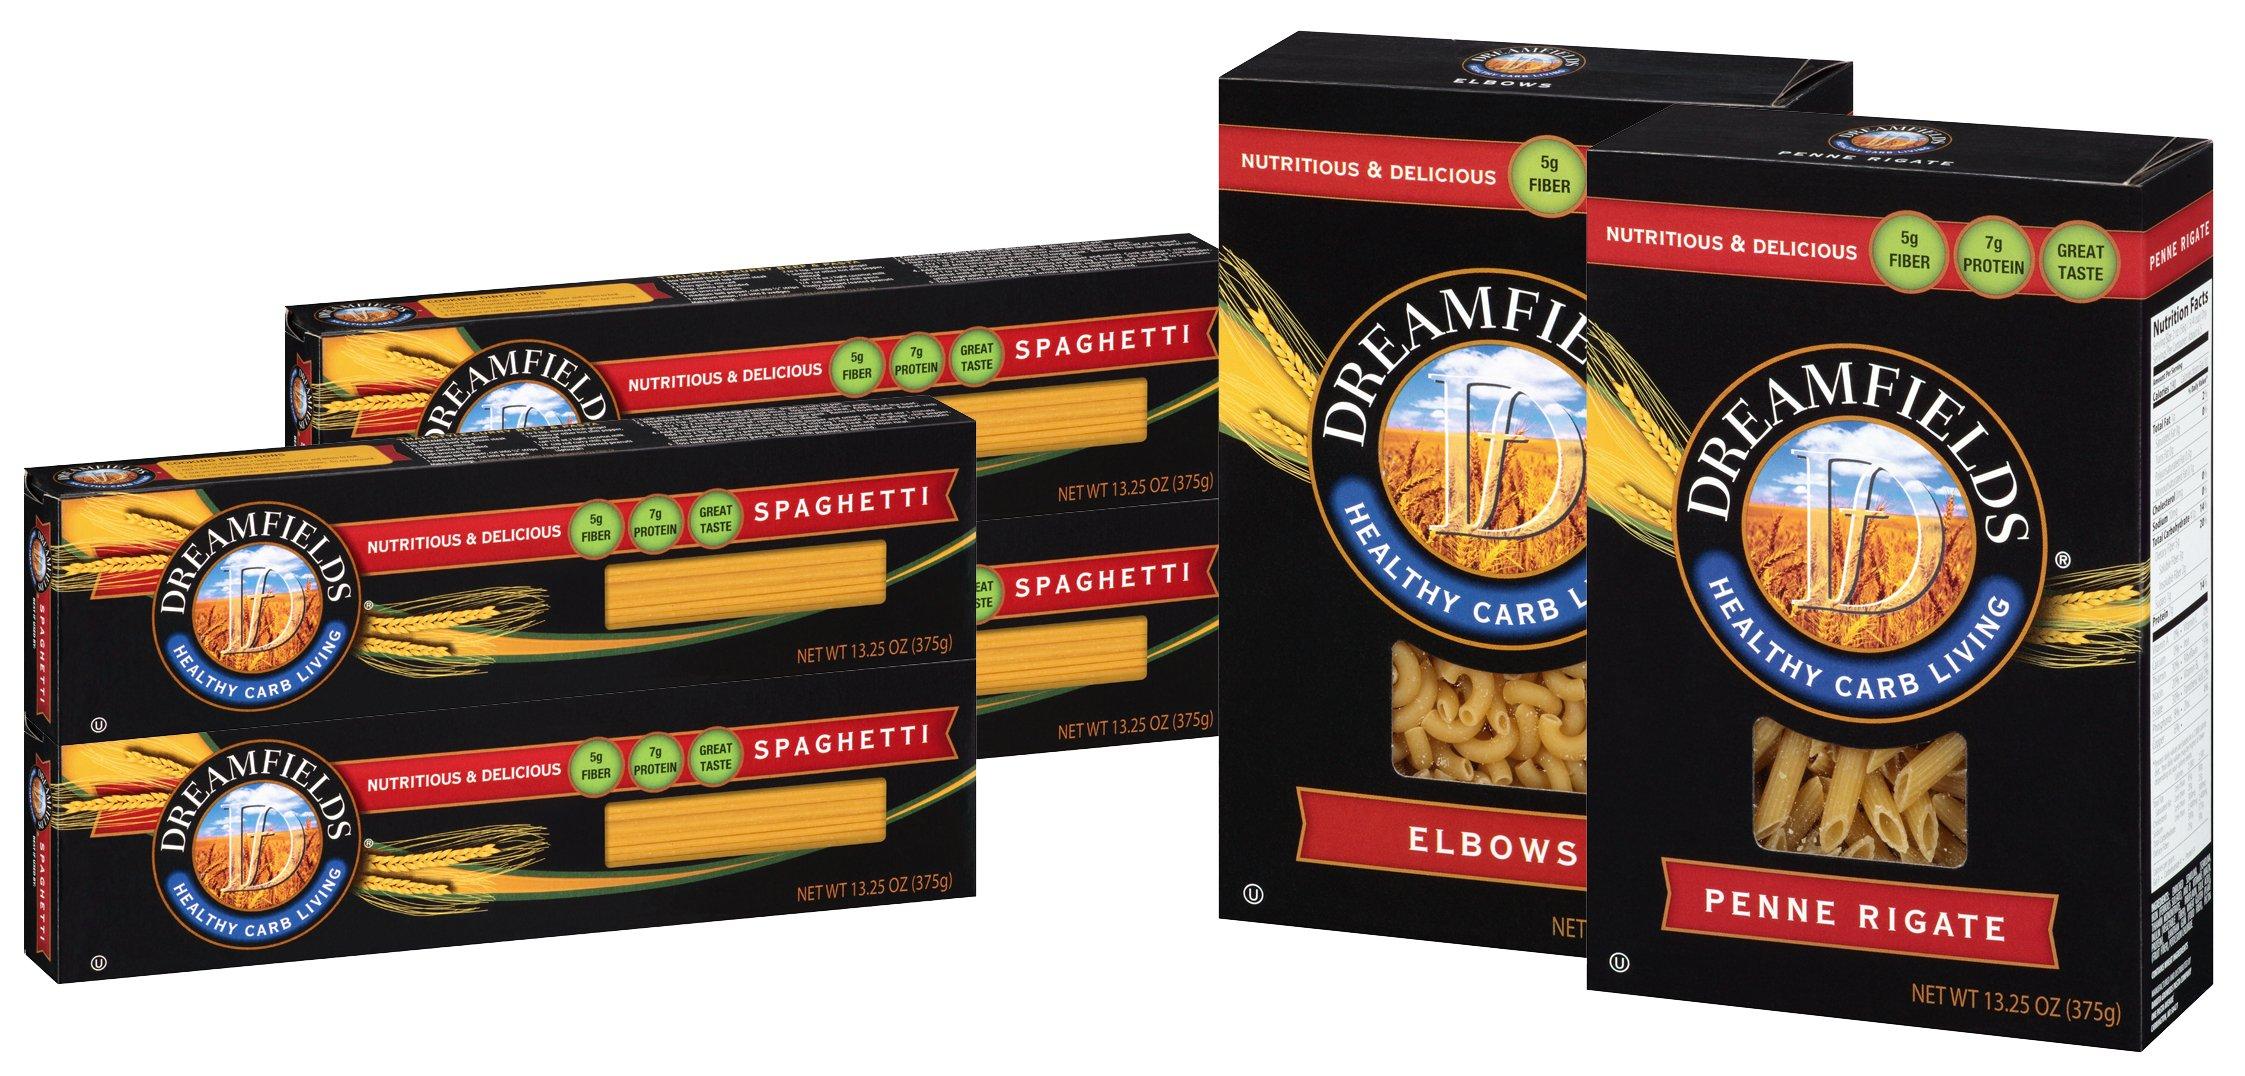 Dreamfields Pasta Healthy Carb Living Variety Six Pack (4 - 13.5 Oz Boxes Spaghetti, 1-13.25 Oz. Box Elbows, 1-13.25 Oz. Box Penne Rigate)